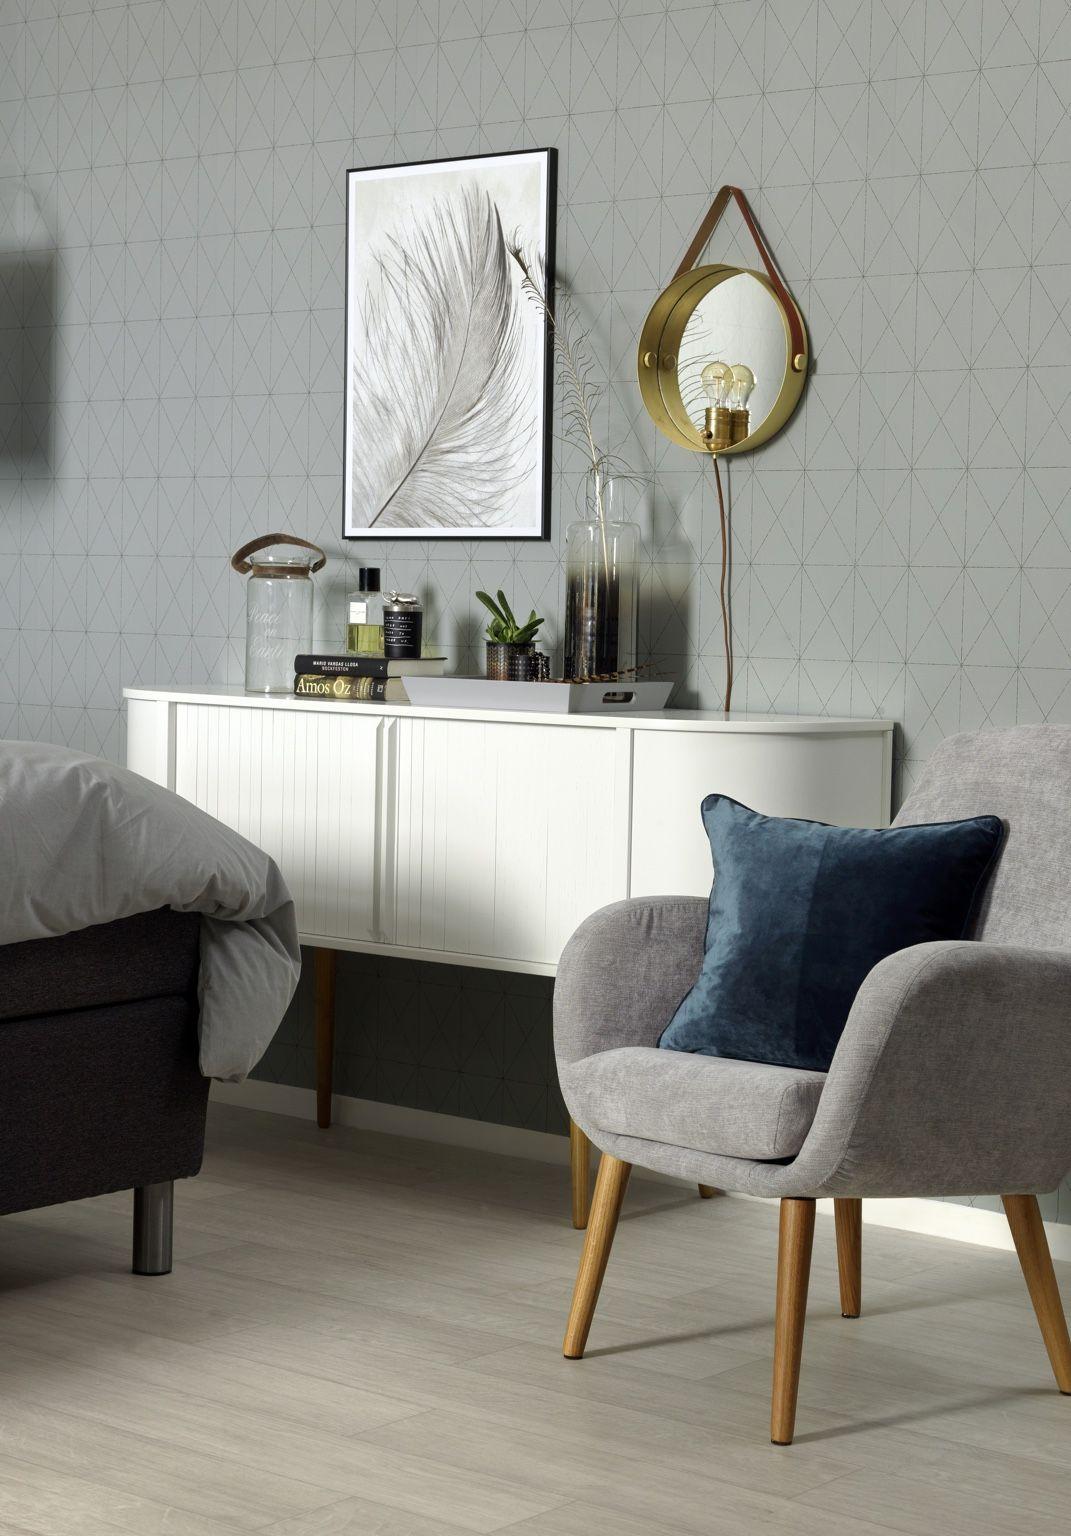 Retromodernt med Form sideboard, snygg och praktisk i sovrummet Sally fåtölj Em home Sovrum